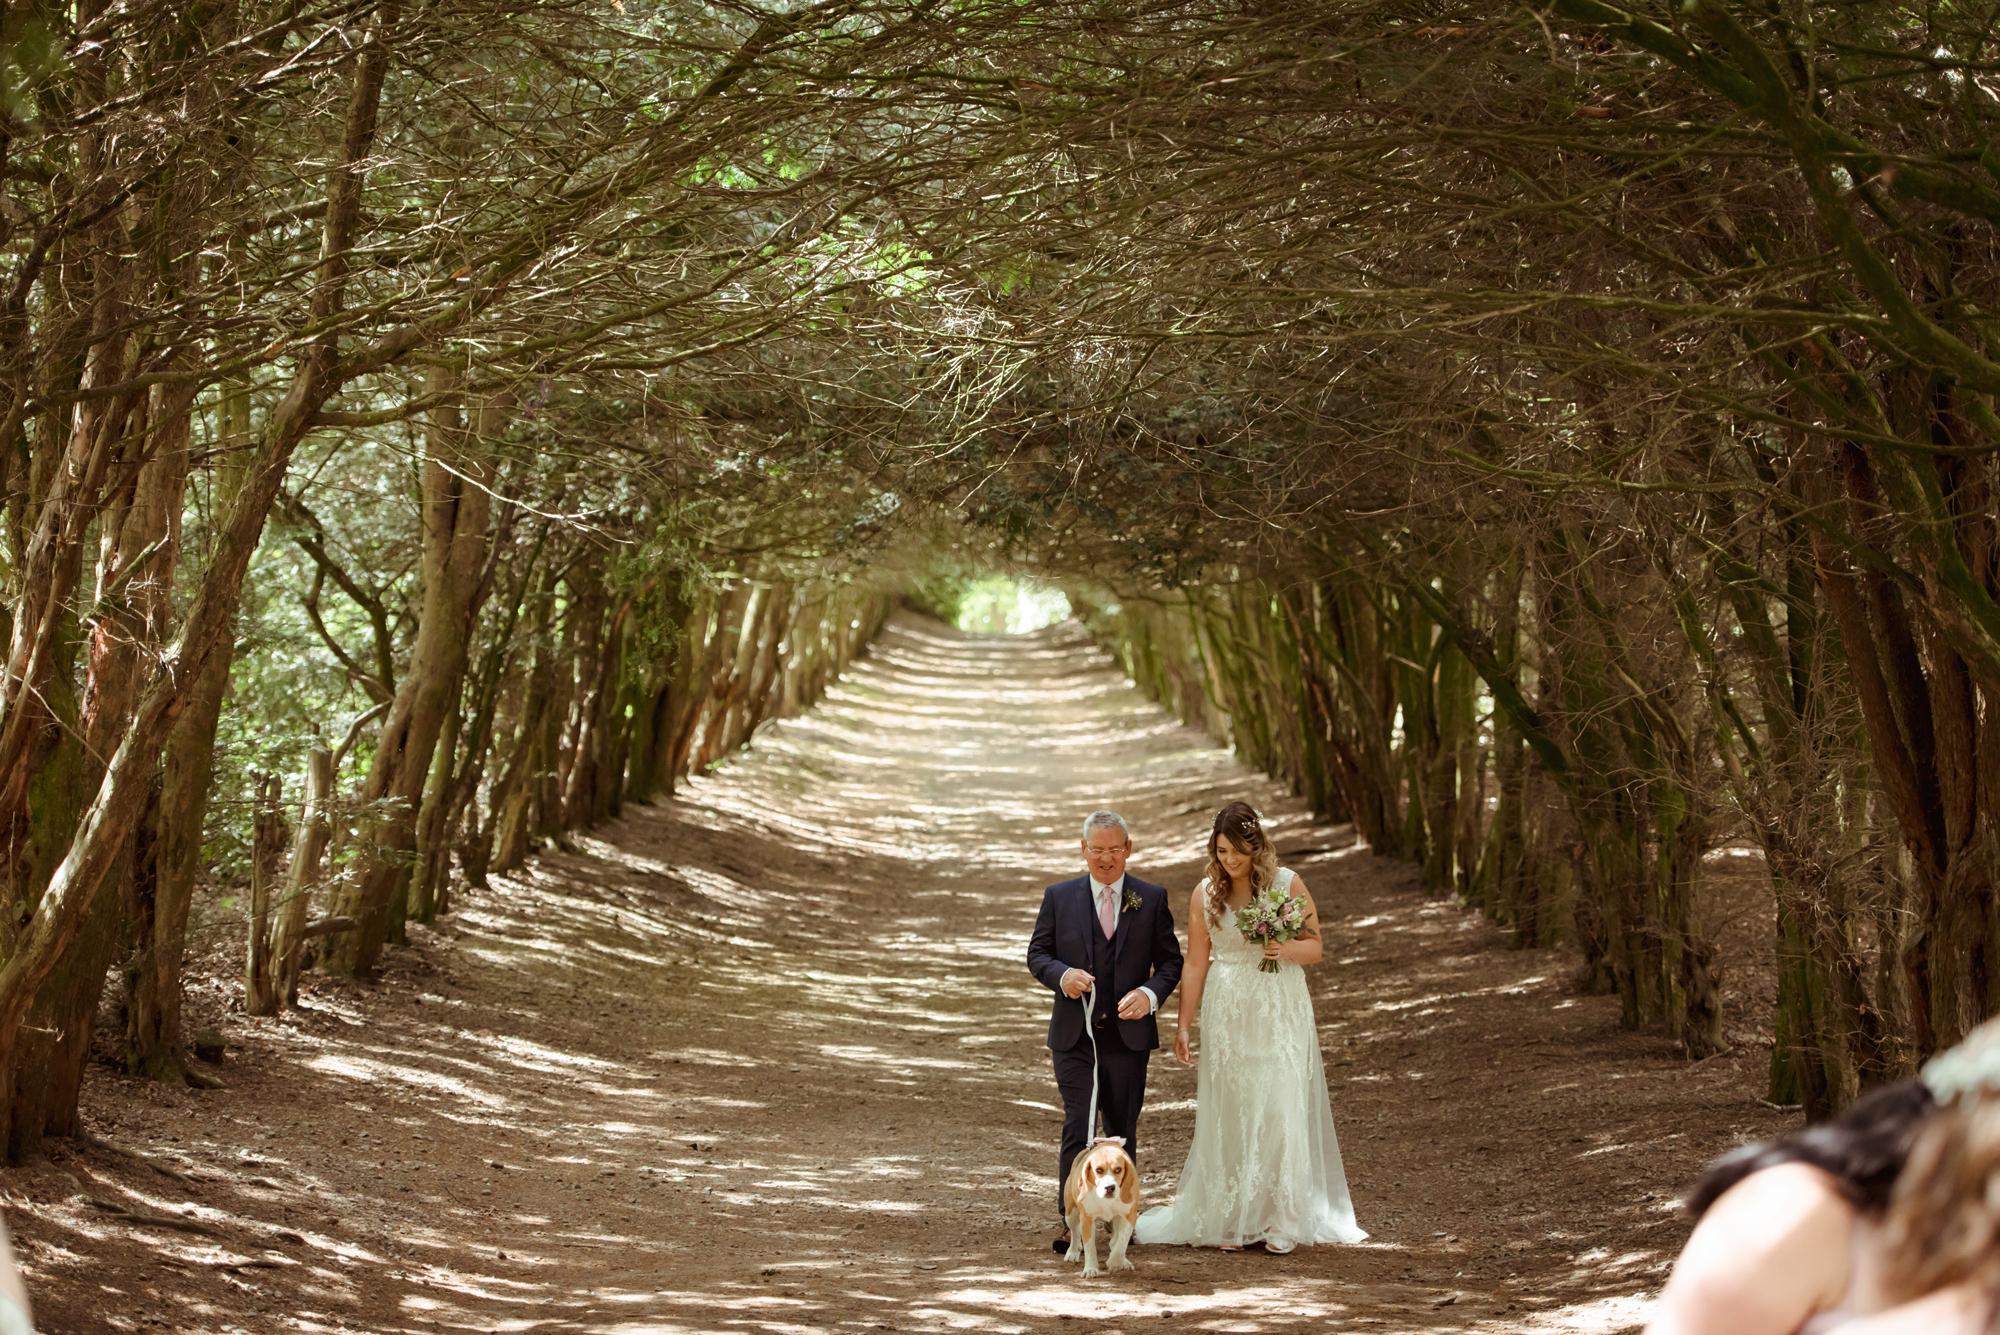 forest-wedding-ceremony-scotland.jpg